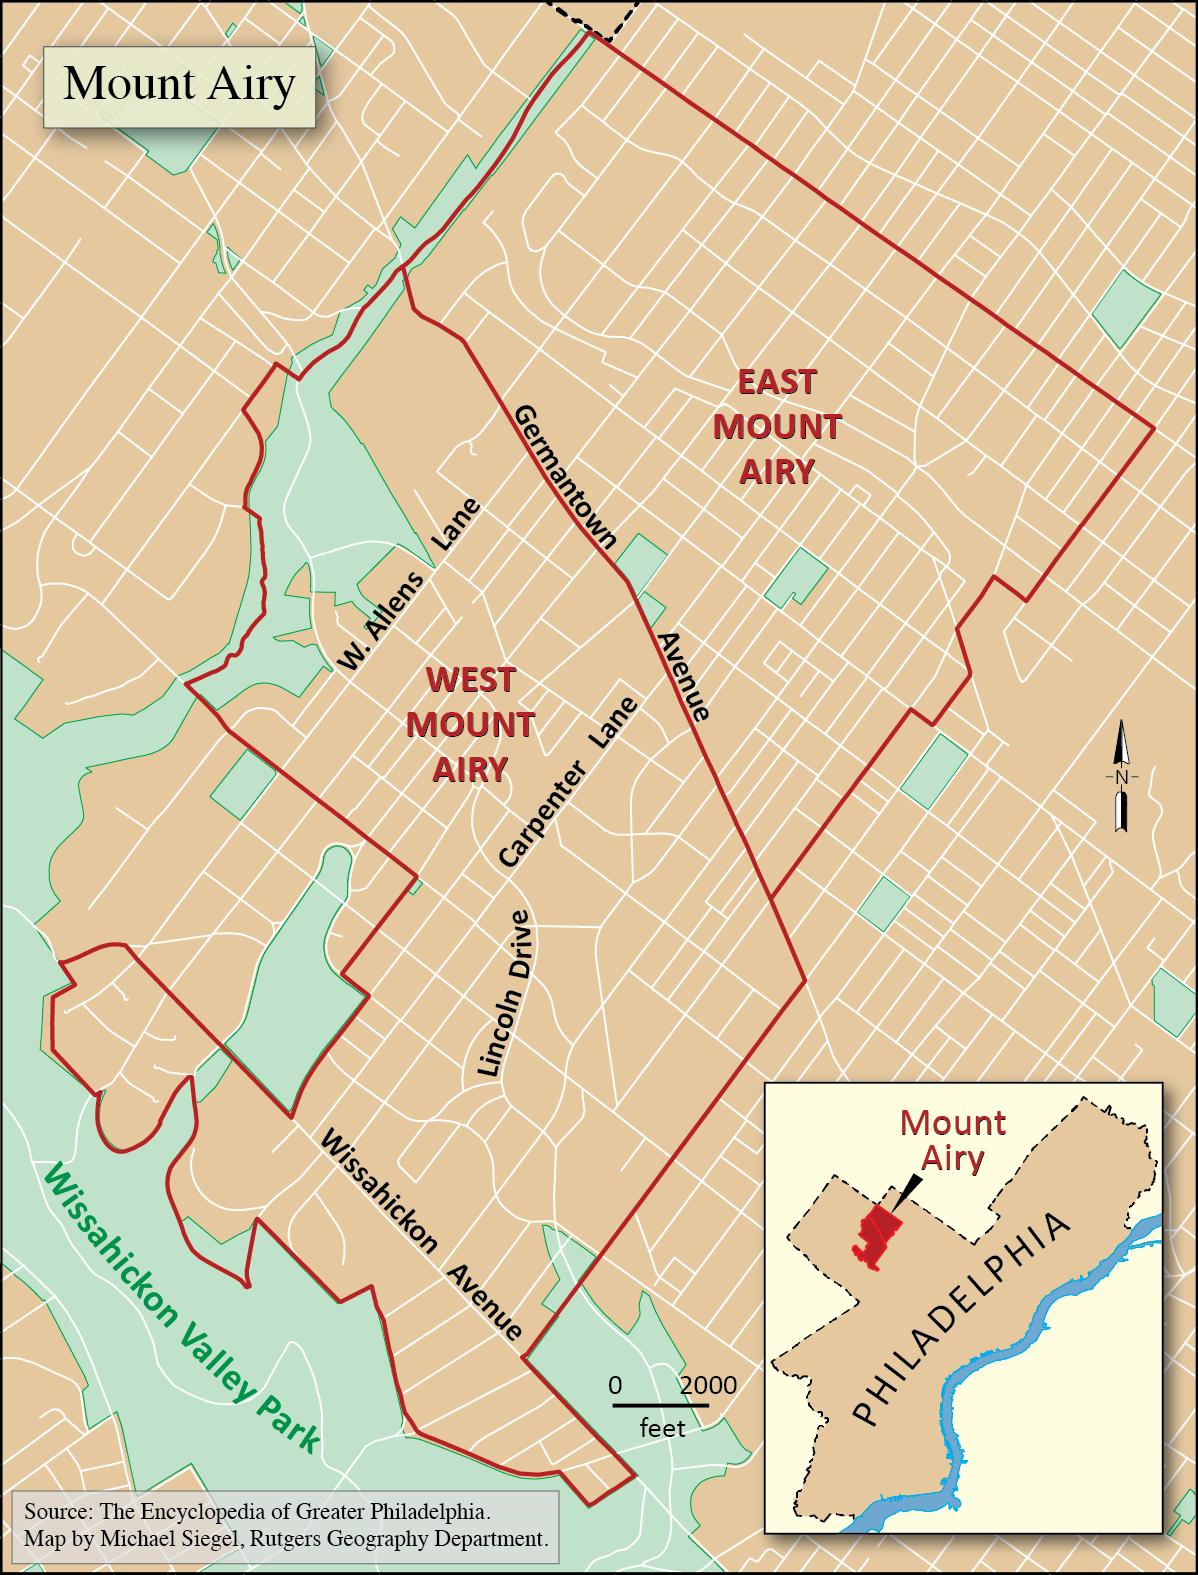 map of germantown philadelphia Encyclopedia Of Greater Philadelphia Mount Airy West And East map of germantown philadelphia